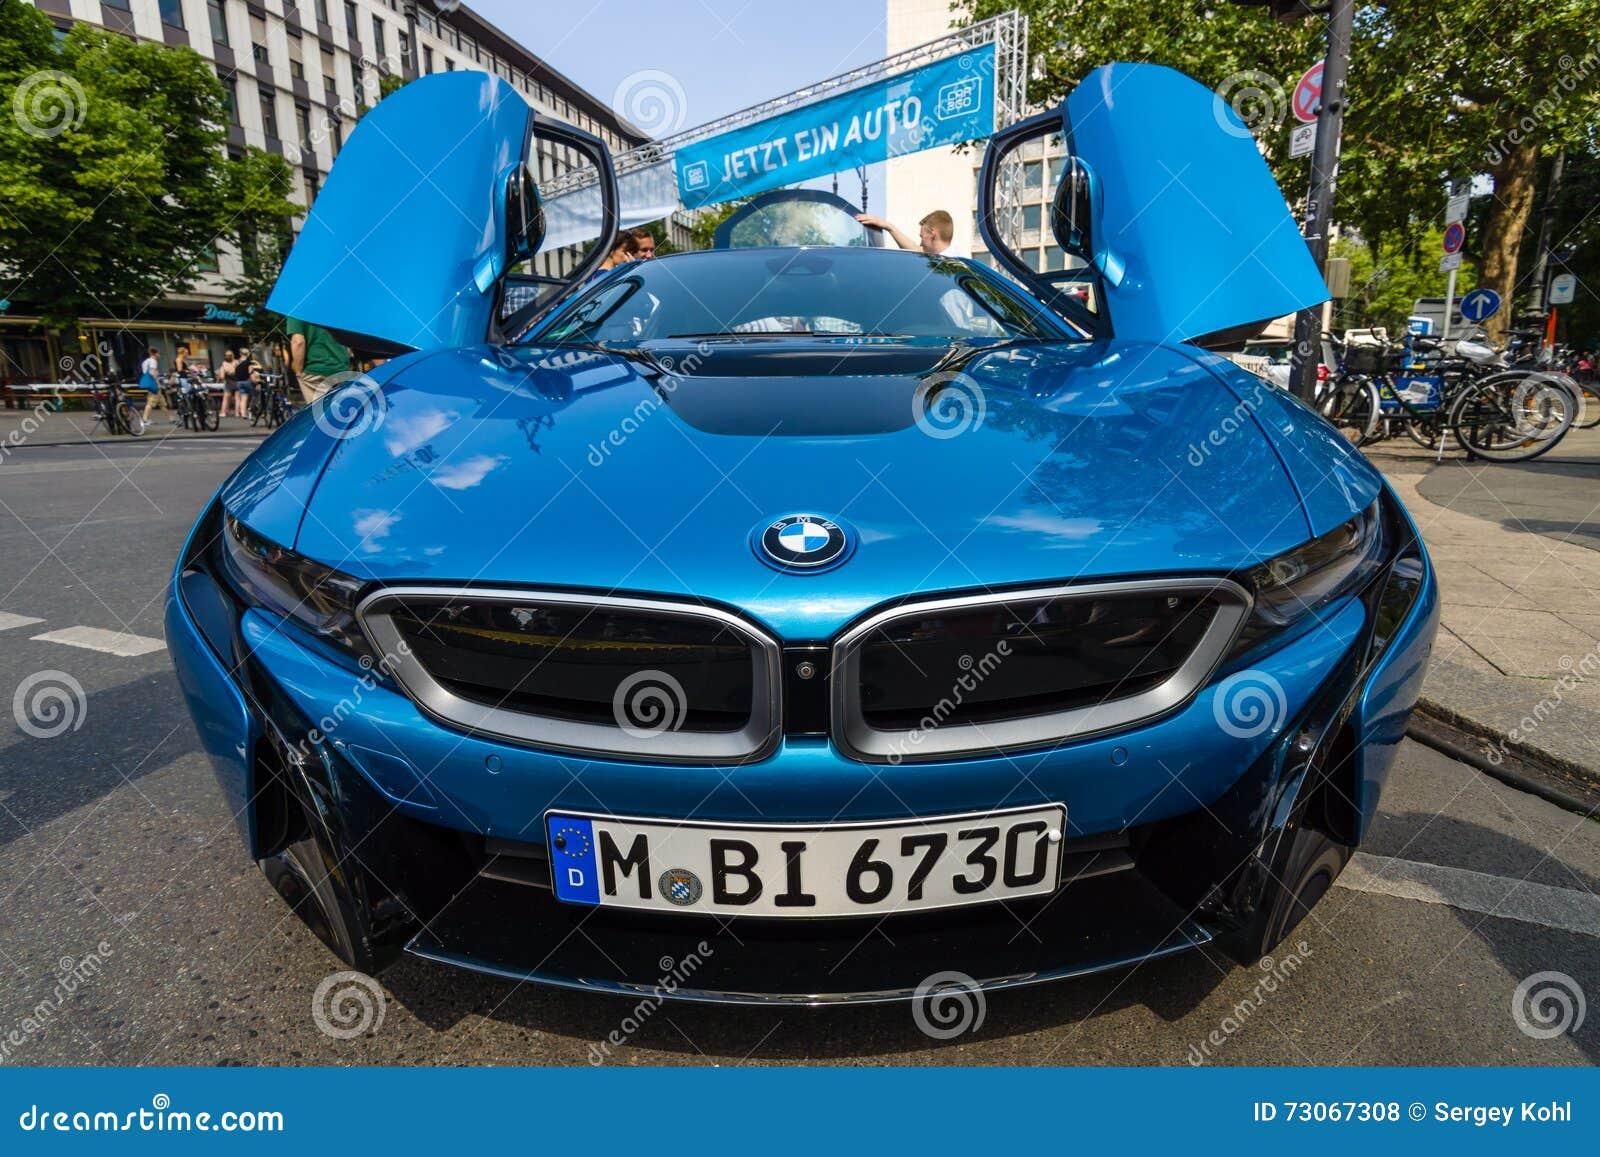 I8 Exterior: Supercar BMW I8 Editorial Stock Photo. Image Of Exterior